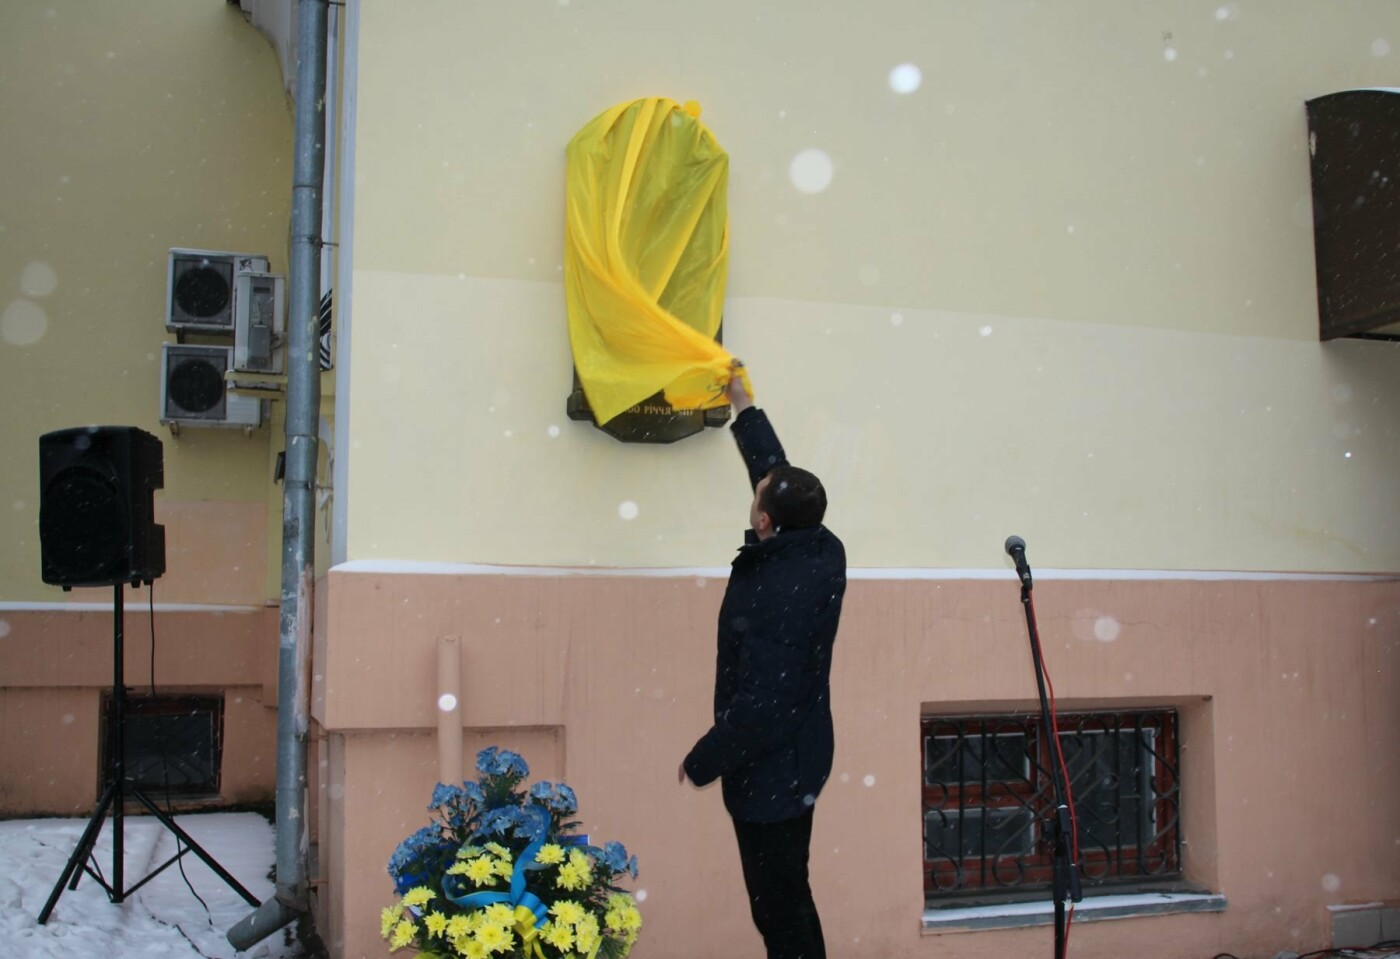 У Хмельницькому відкрили пам'ятну дошку Коновальцю, фото-2